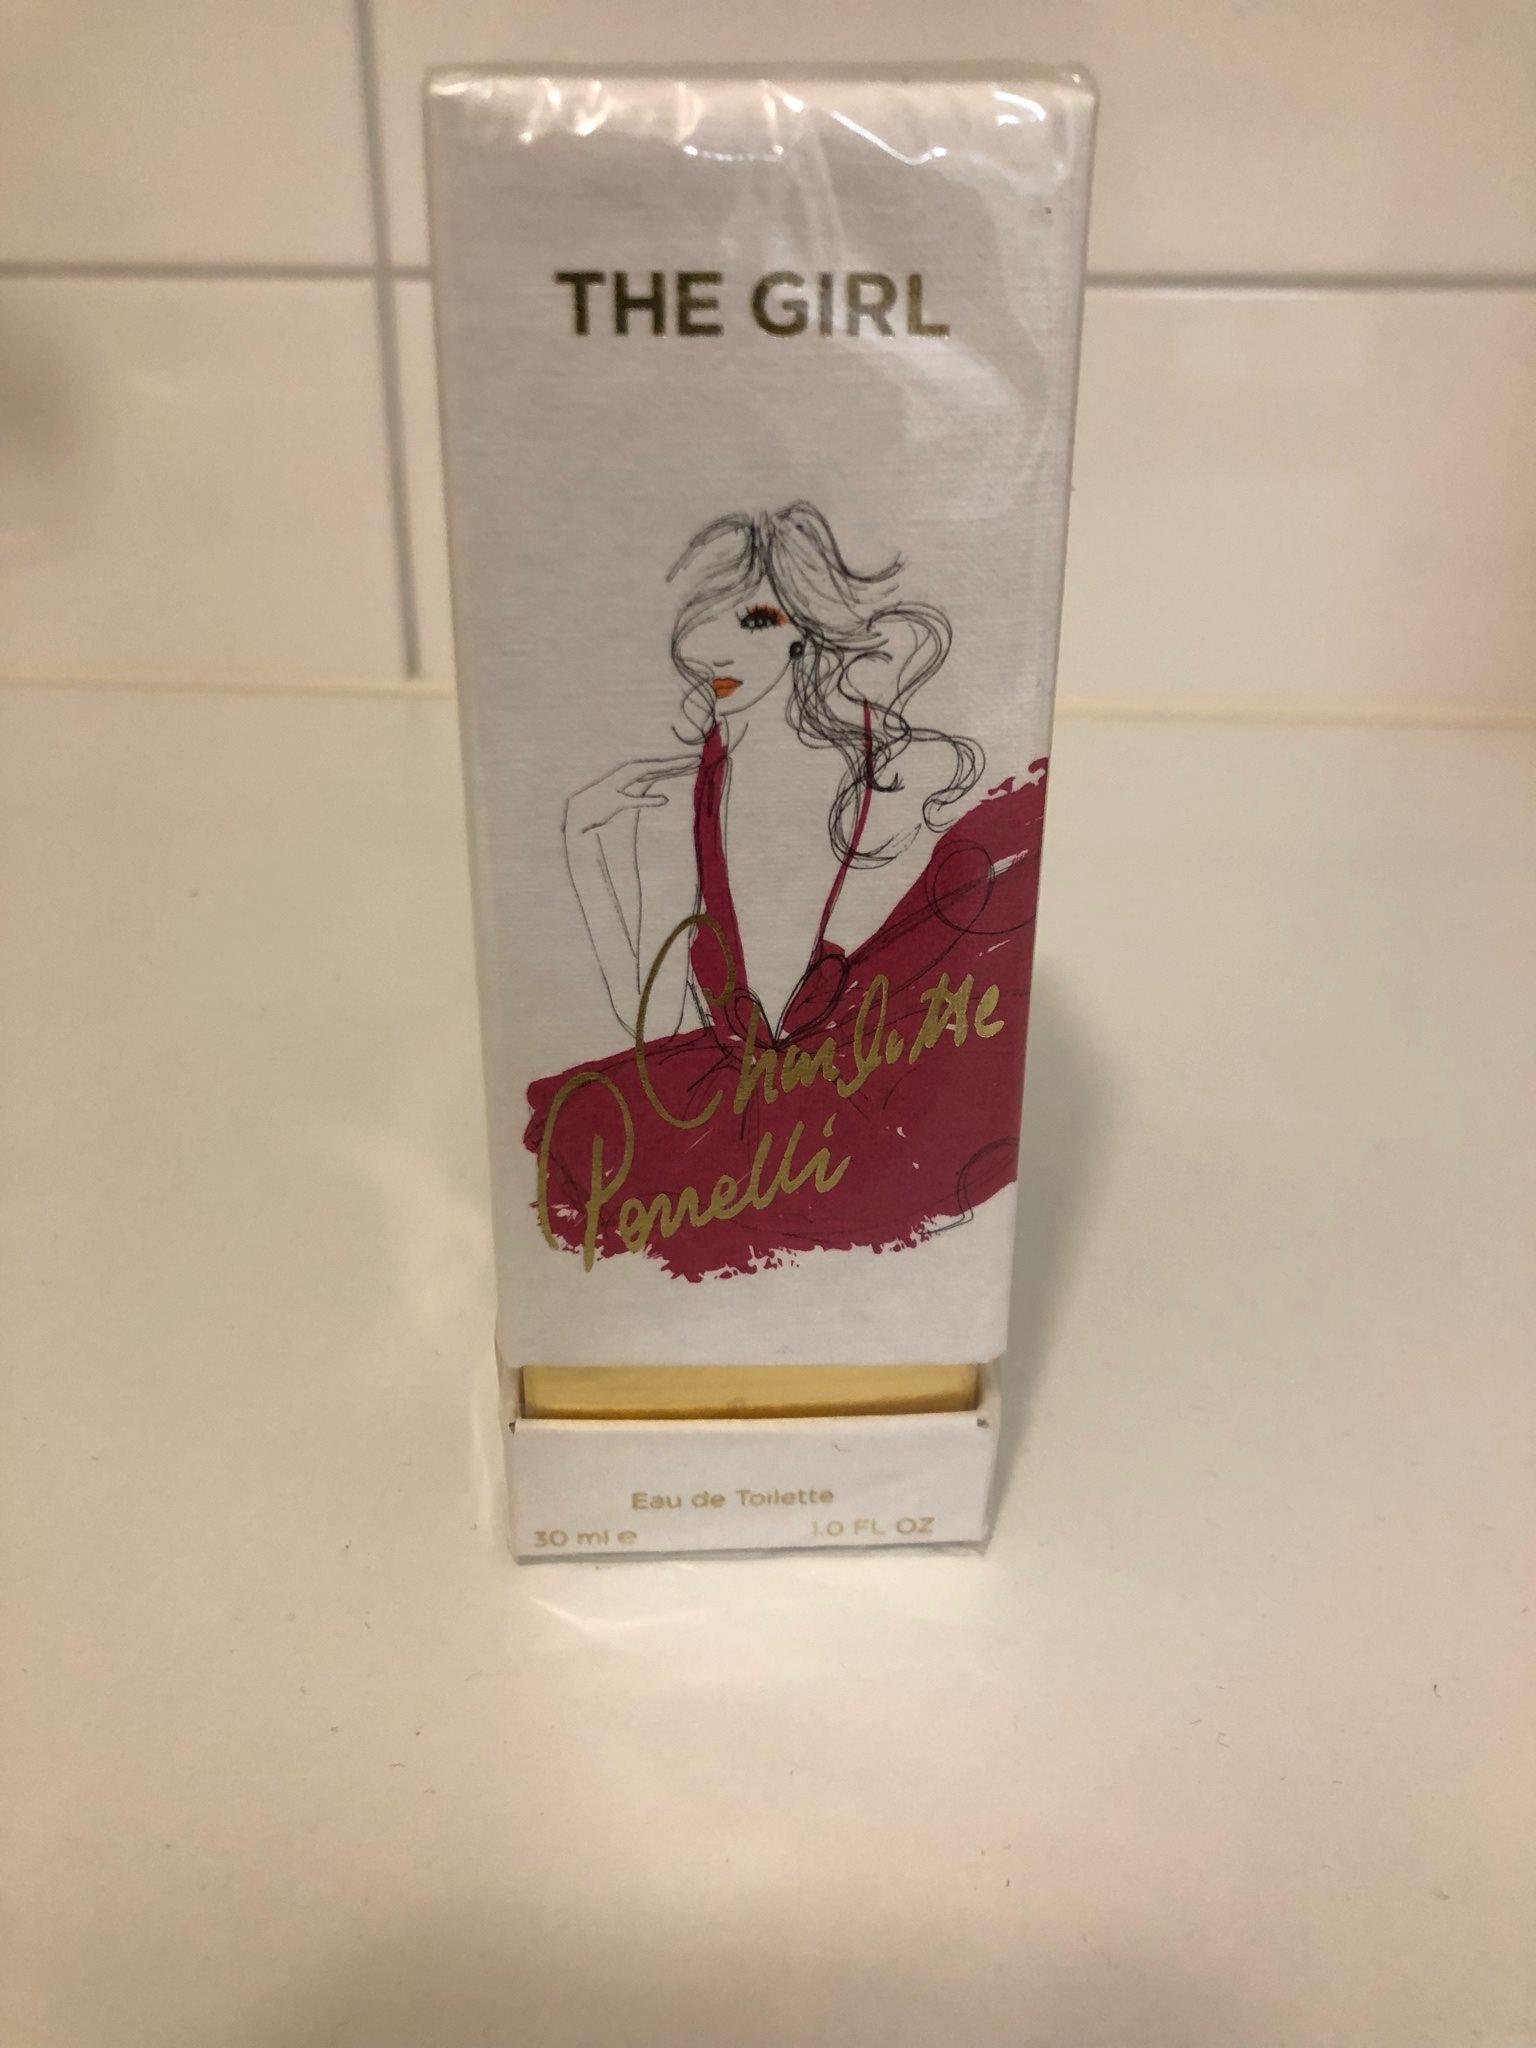 the girl parfym